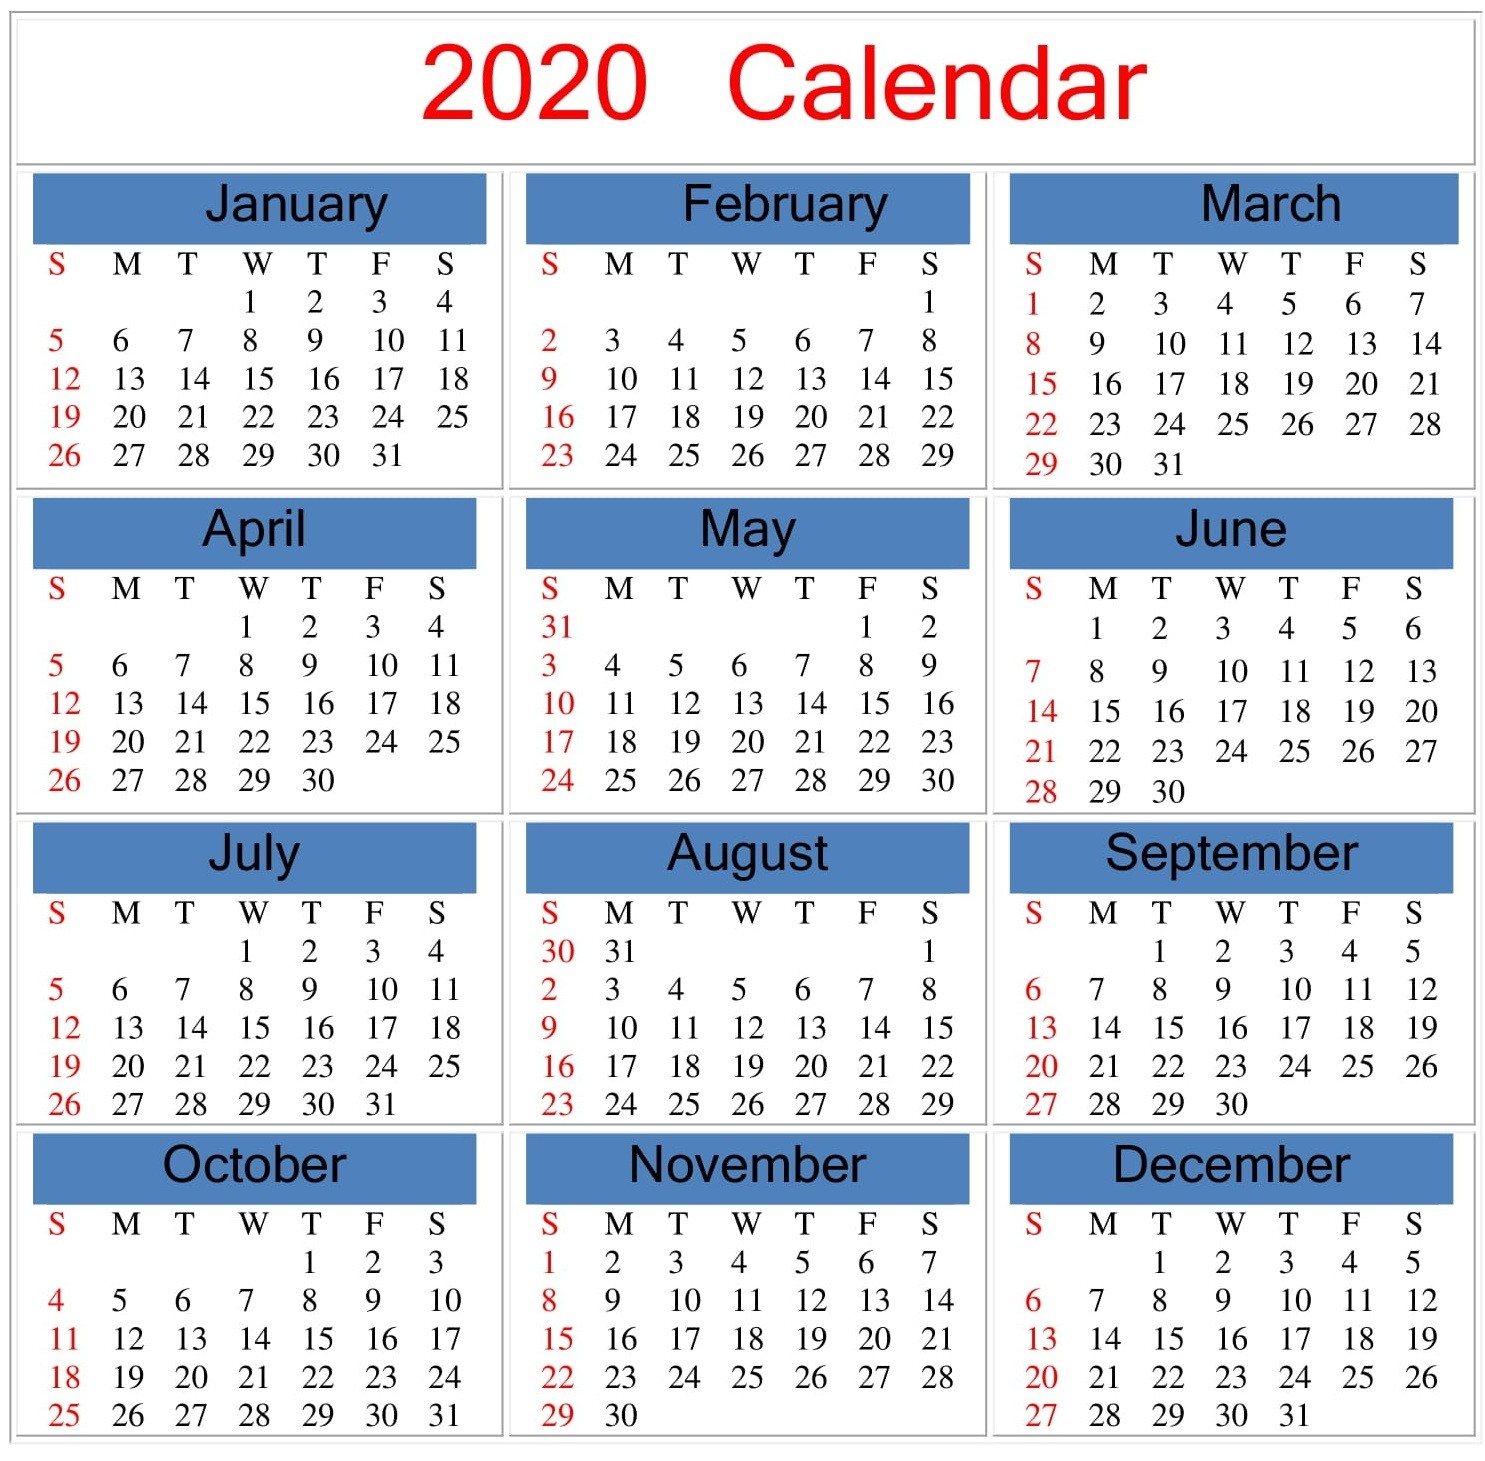 Printable 2020 Calendar Word Document - Latest Printable  365 Day Julian Calendar January